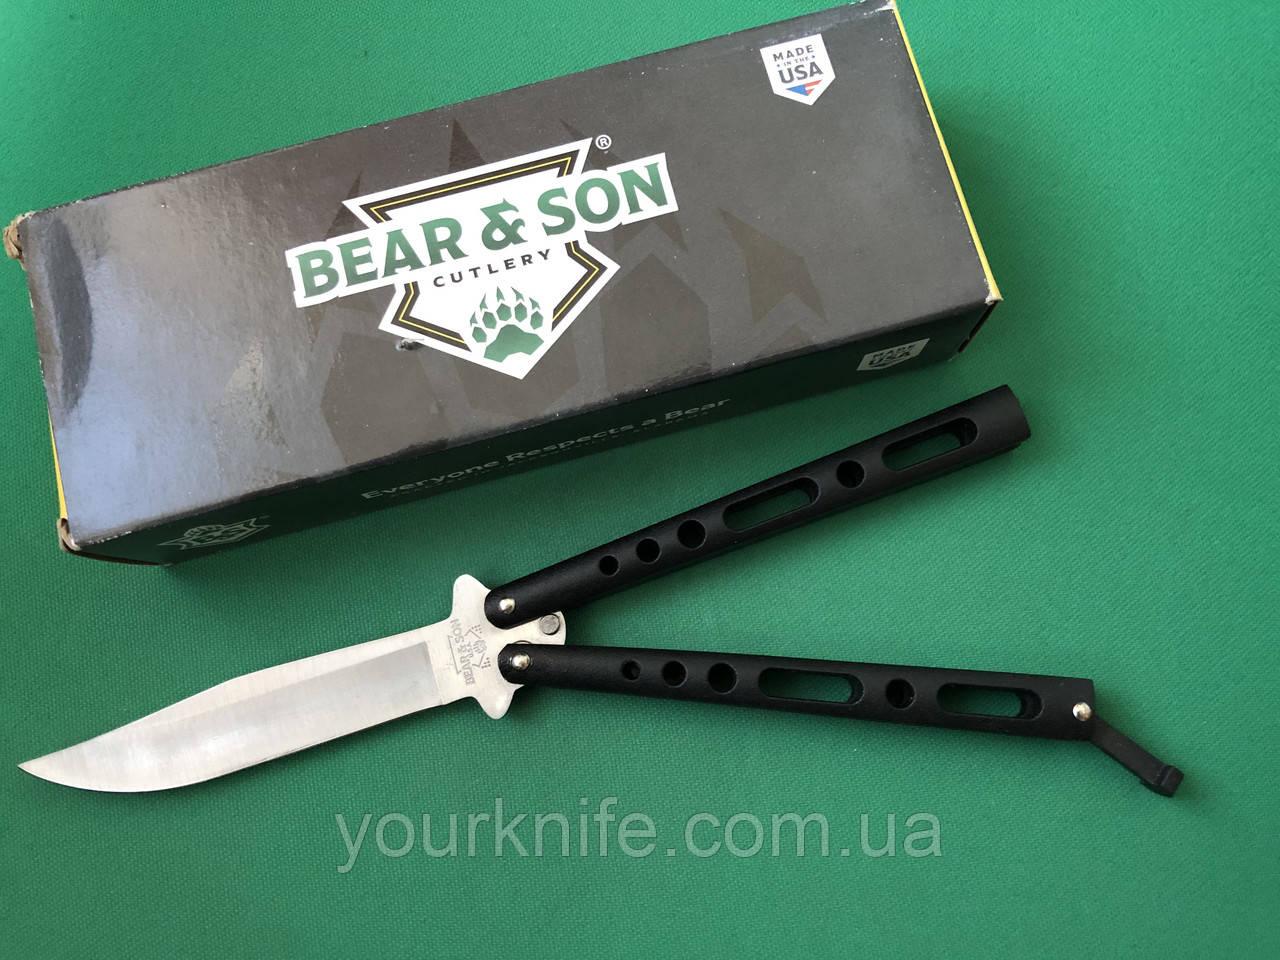 Купить Нож Bear & Son Balisong